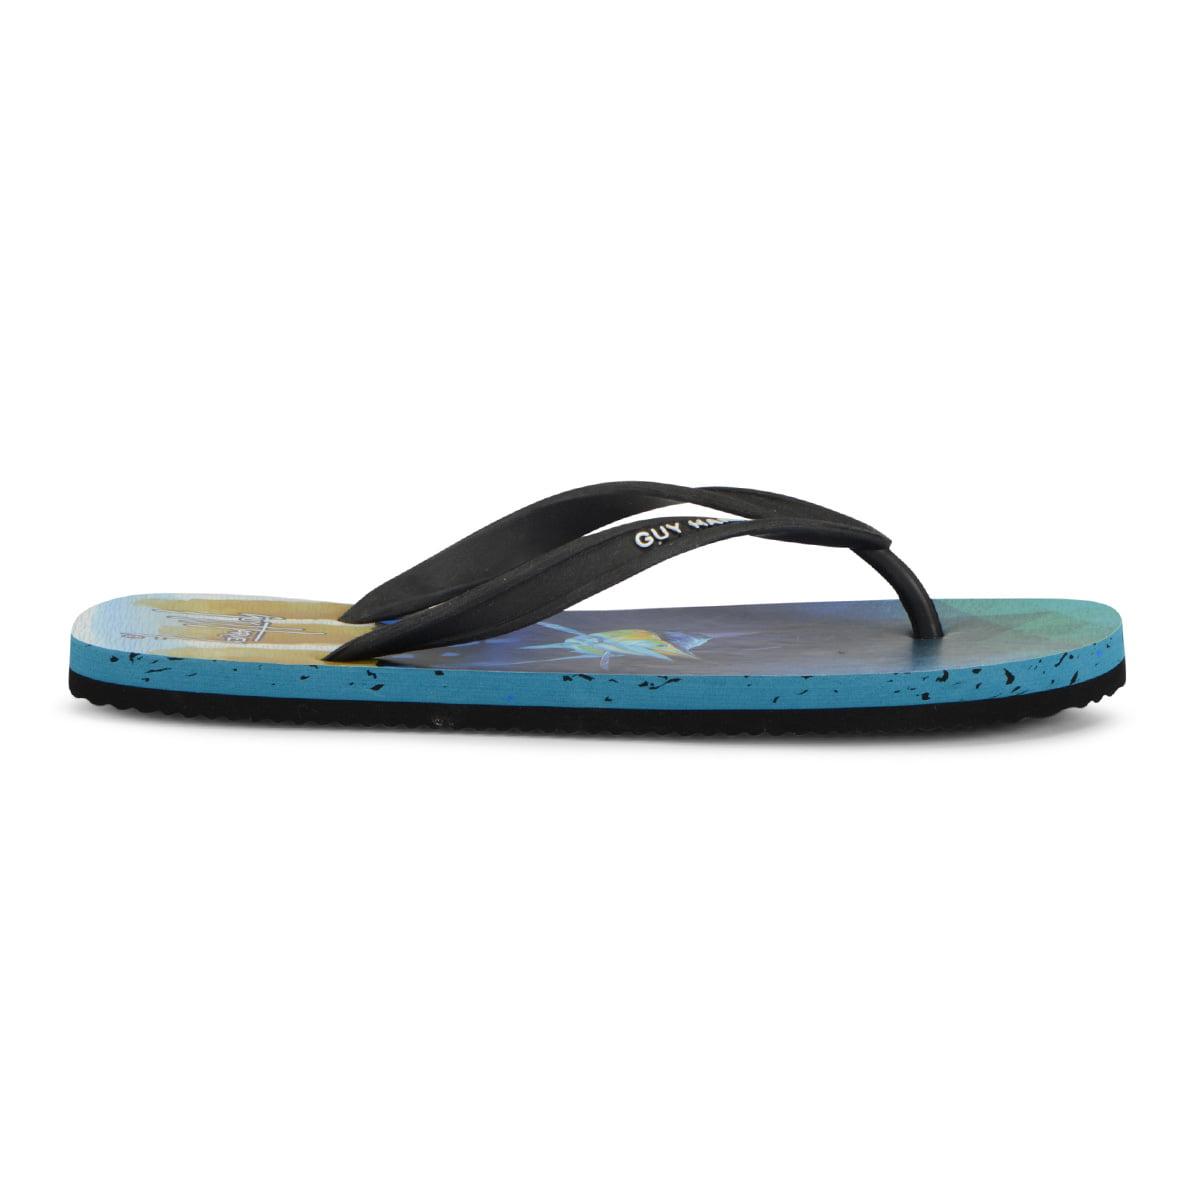 Mens Budweiser // Bud Light Flip Flop Sandals NWT MSRP $24